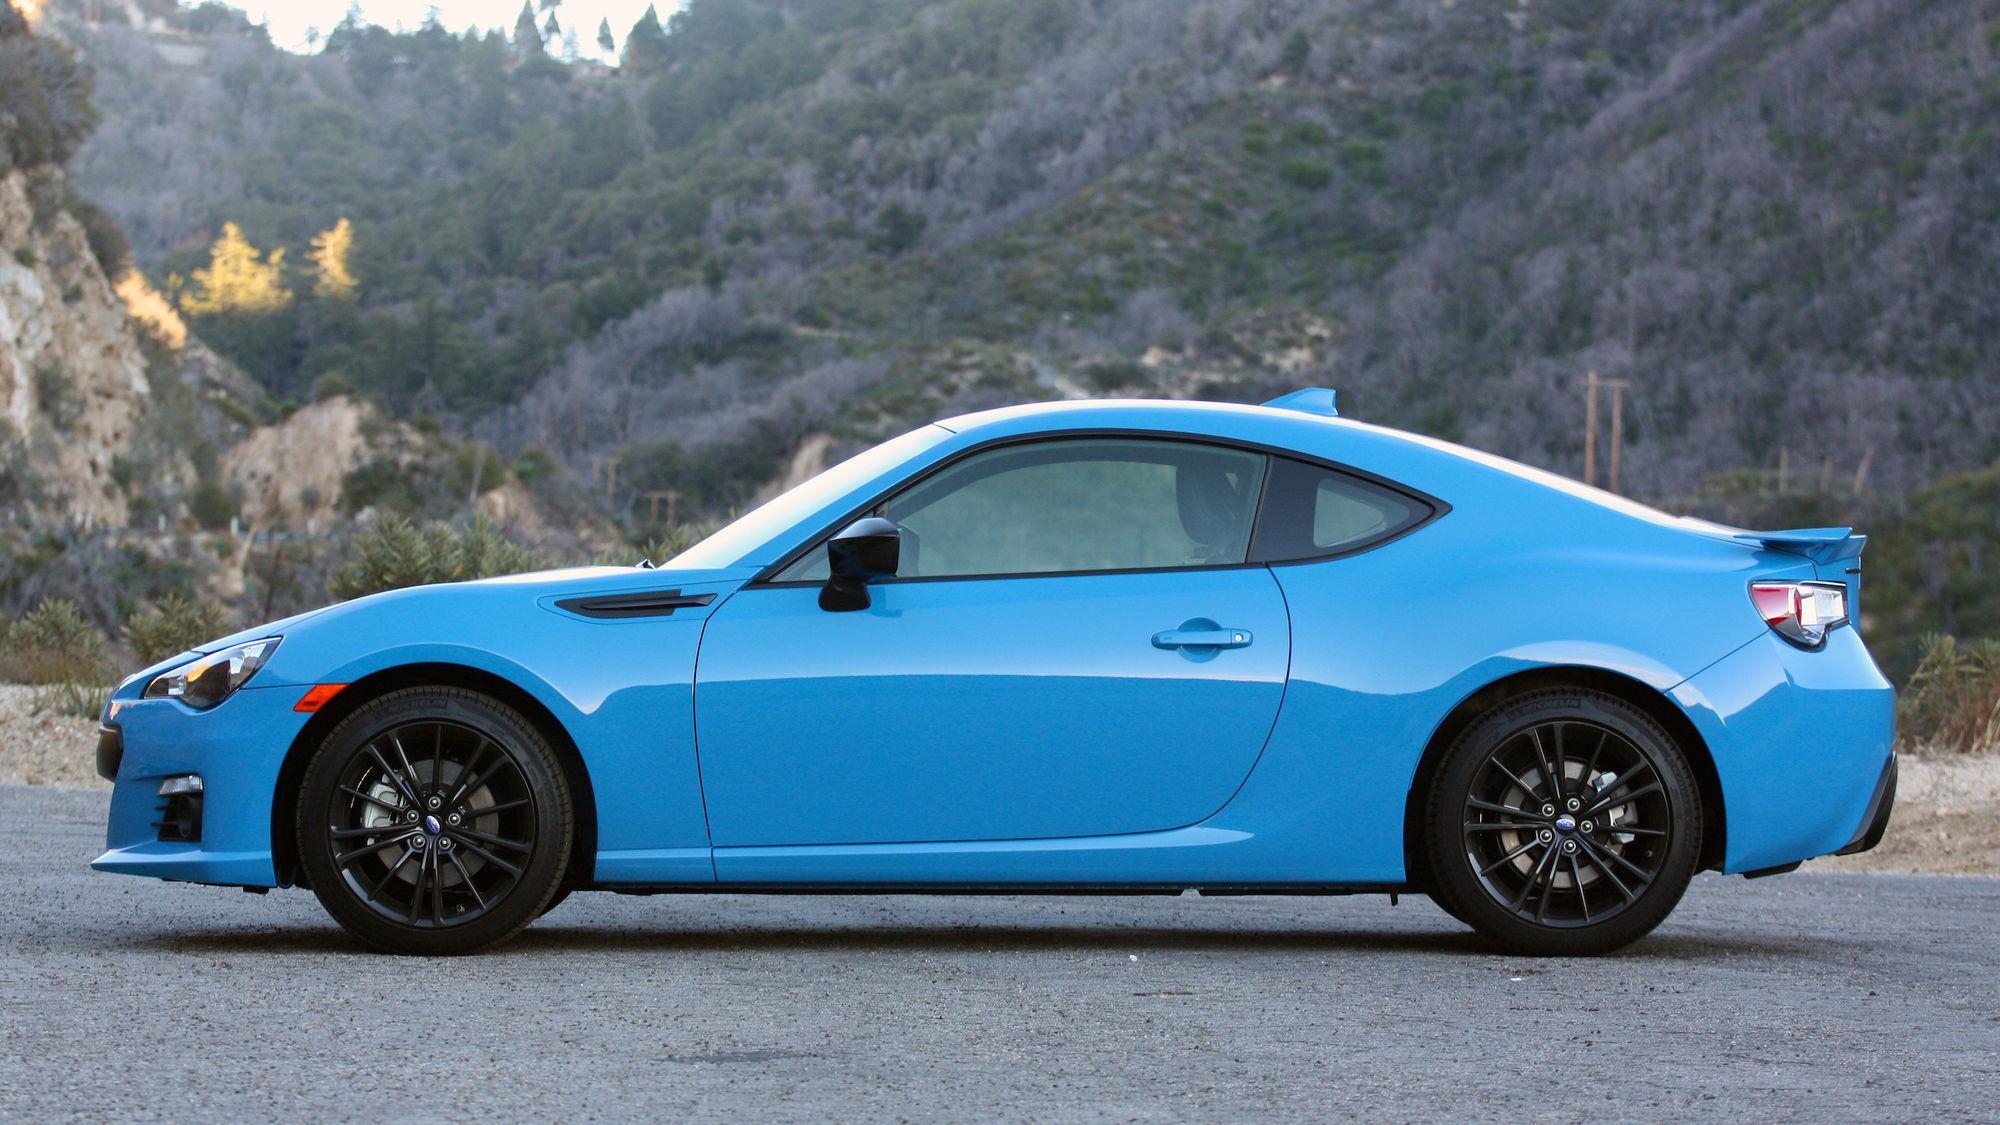 Hyper Blue Brz >> 2016 Subaru Brz Series Hyperblue Quick Spin Autoblog